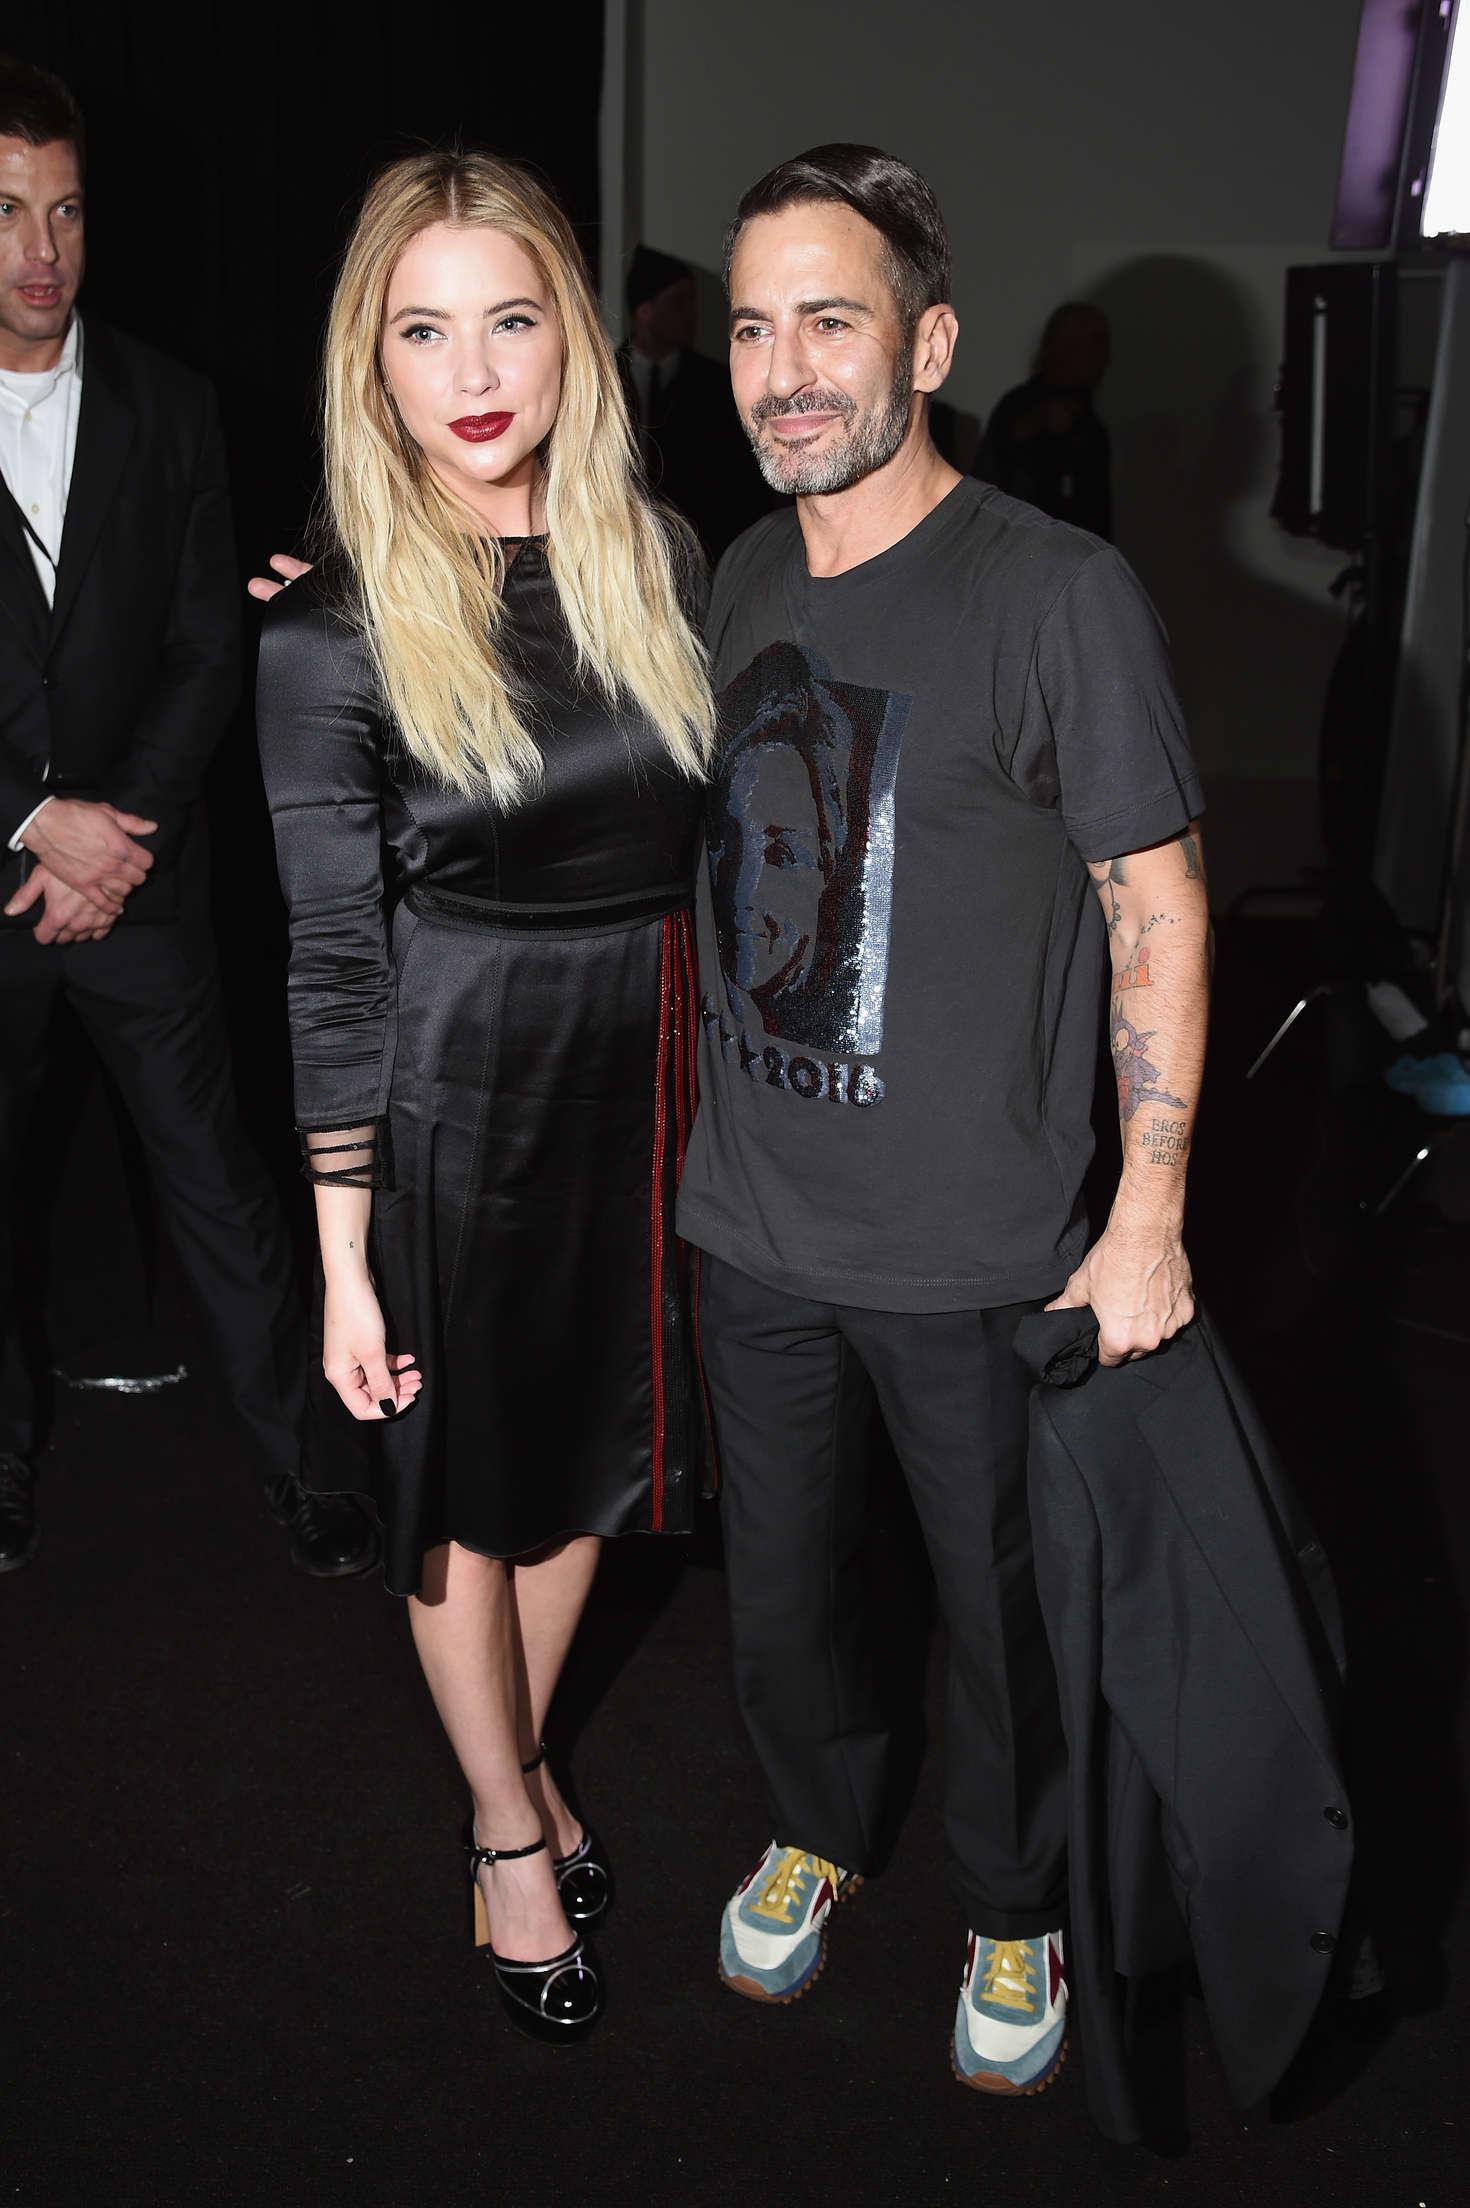 Ashley Benson - Marc Jacobs 2016 Fashion Show in NYC